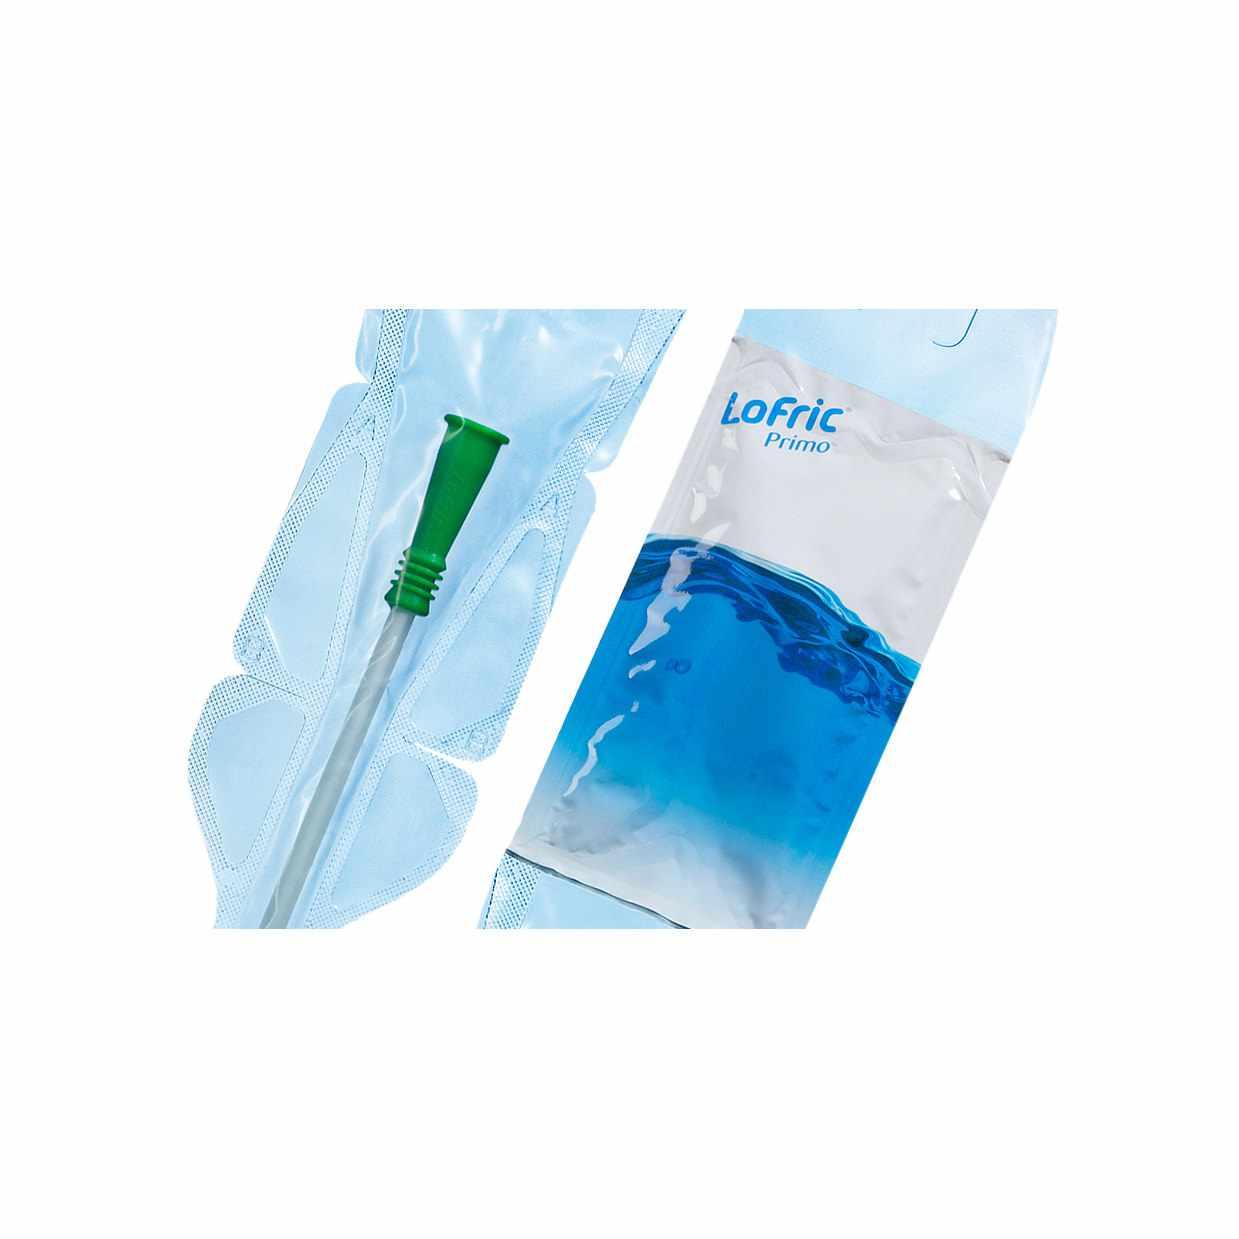 Wellspect LoFric Primo Hydrophilic Intermittent Catheter, 8 Fr